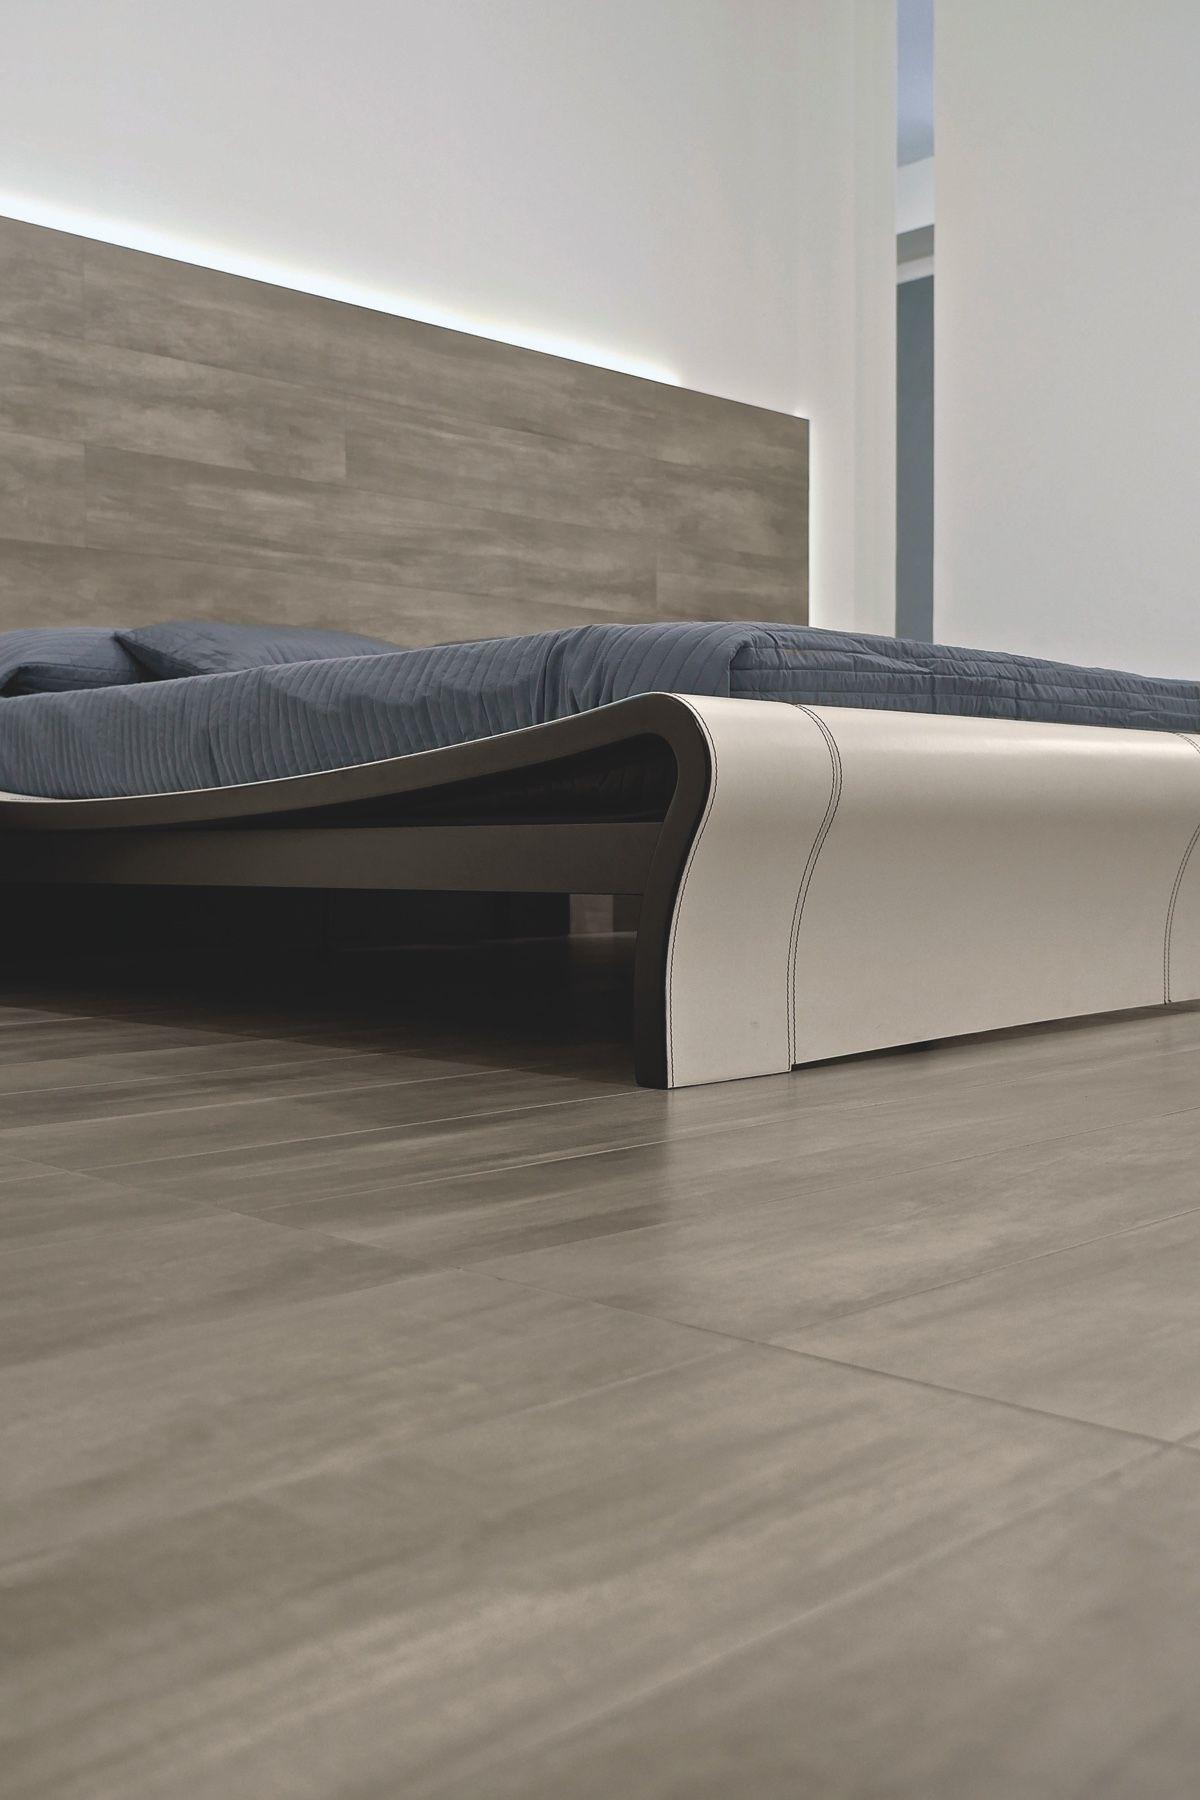 Casalgrande Padana's Ceramic Tiles for Bedrooms #tile #ceramics #architecture #bedroom #night #sleep #inspirational